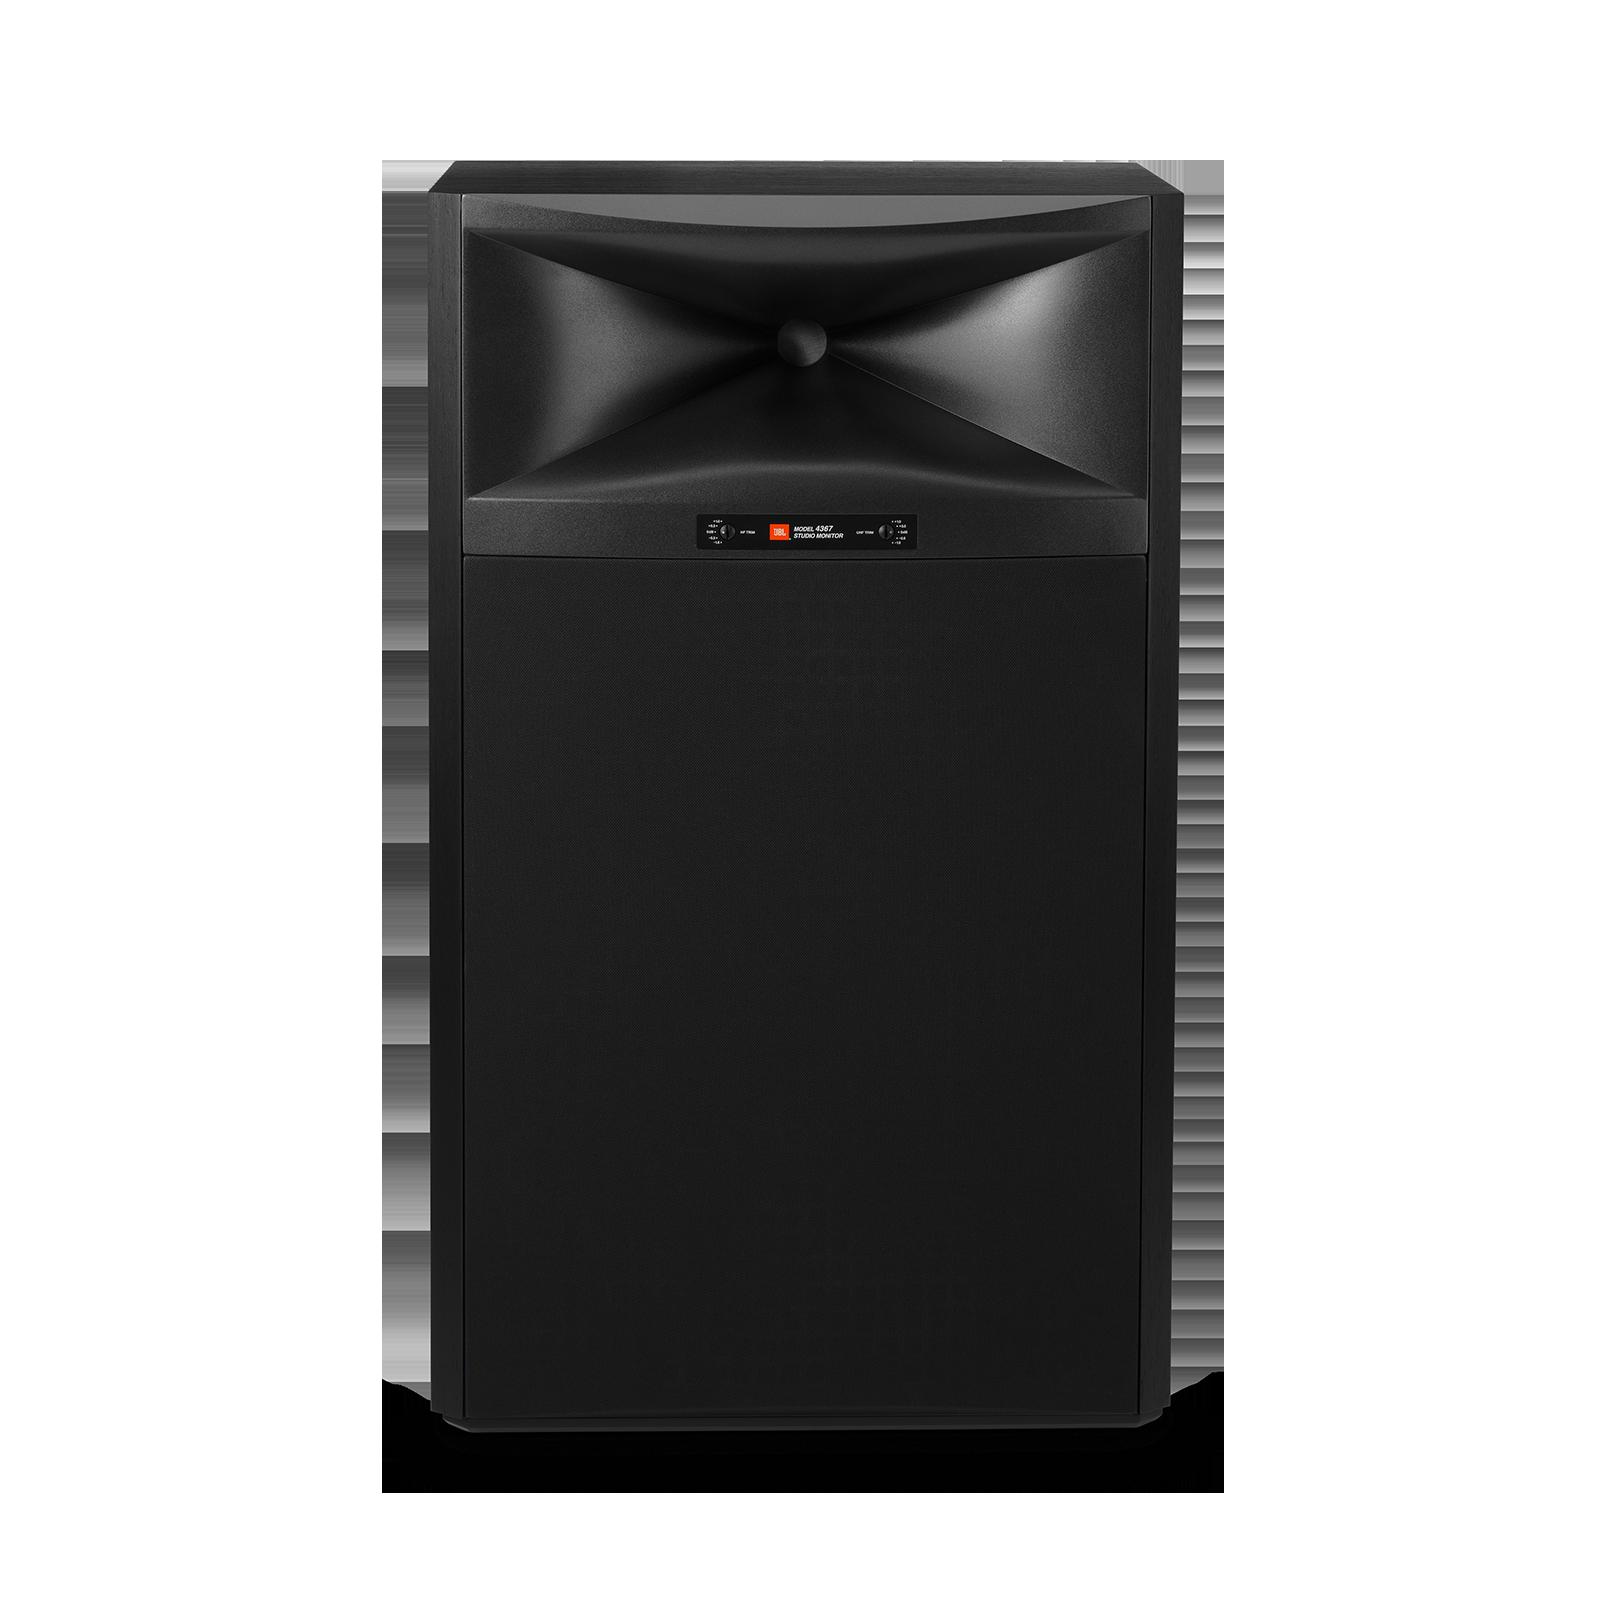 "4367 - Black - 2-way 15"" (380mm) Floorstanding Studio Monitor Loudspeaker - Hero"